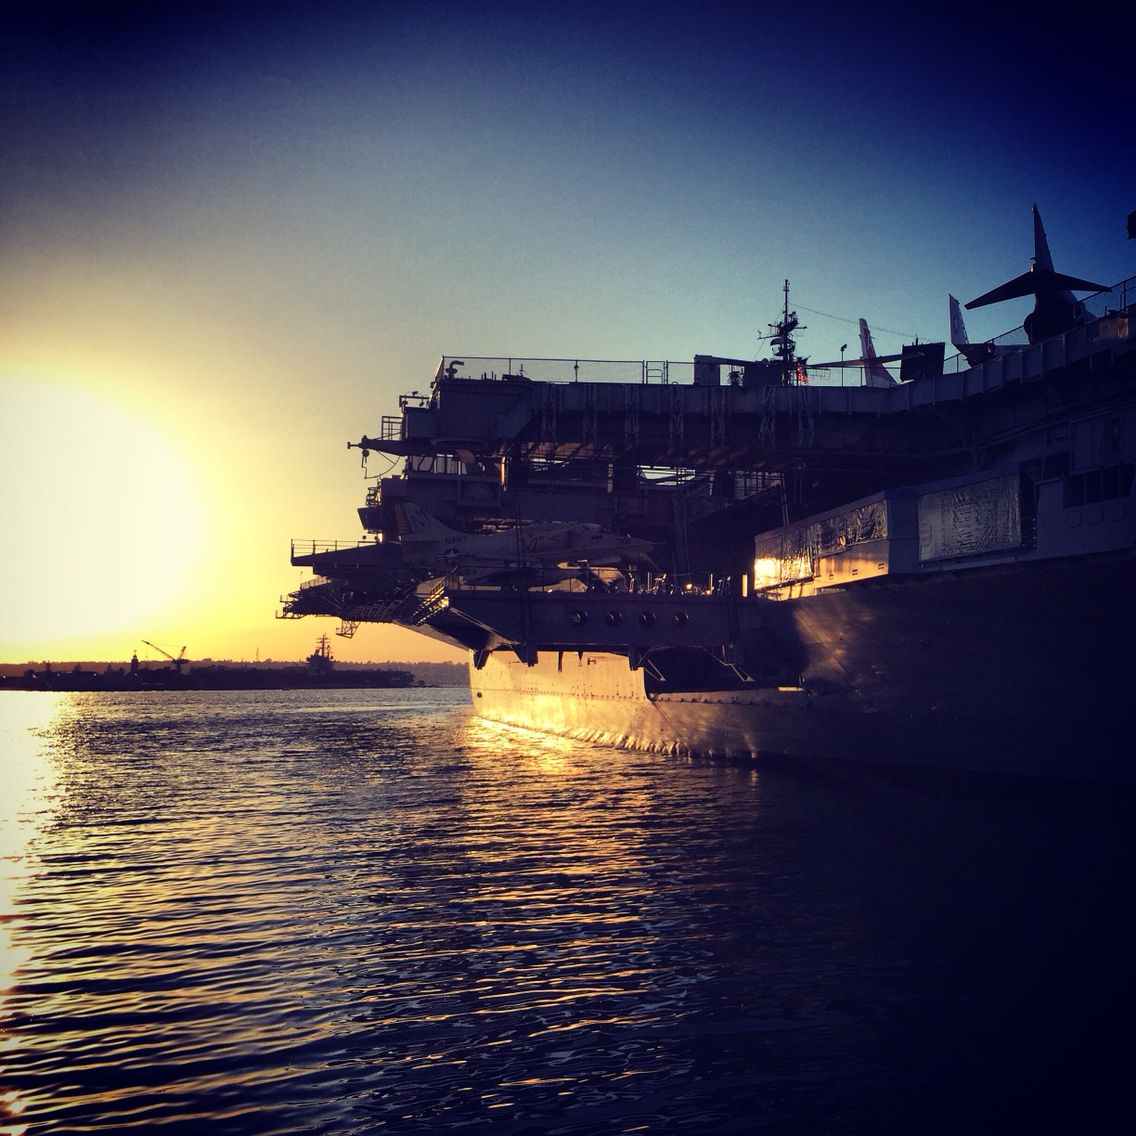 The harbor in San Diego, California